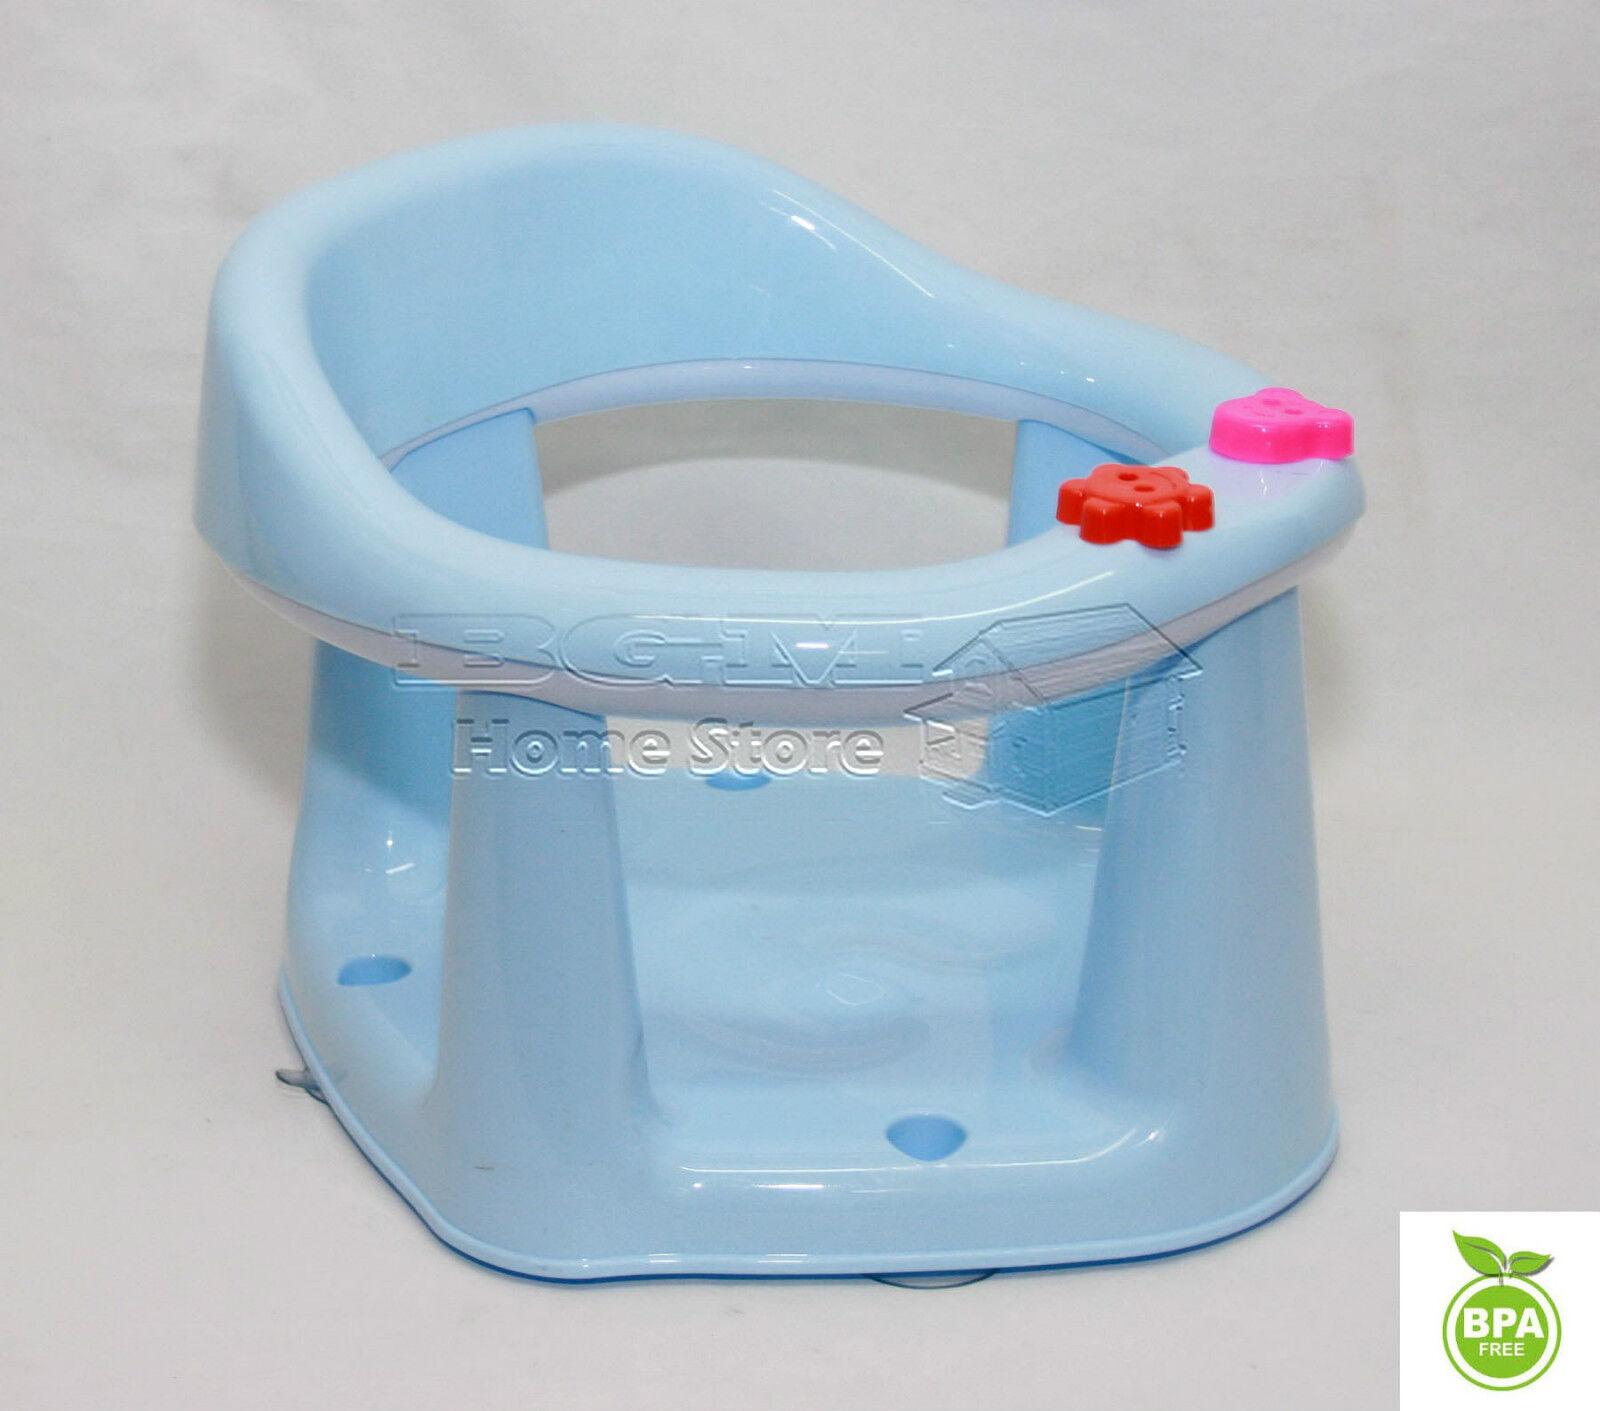 Funky Tub Ring Seat Component - Bathtub Ideas - dilata.info